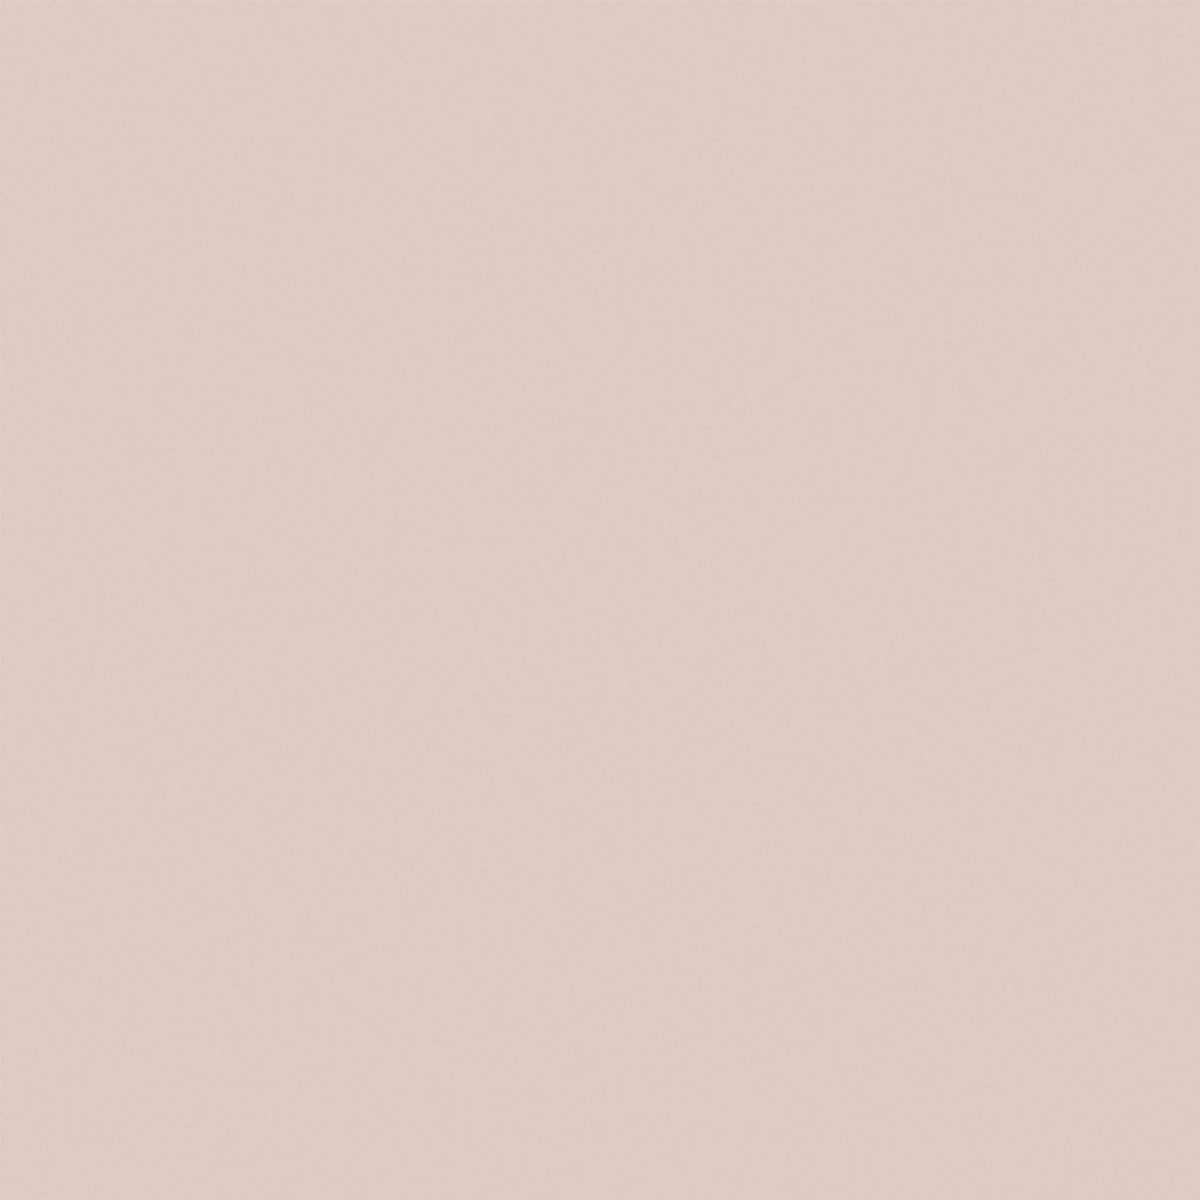 8858 Just Rose - Formica